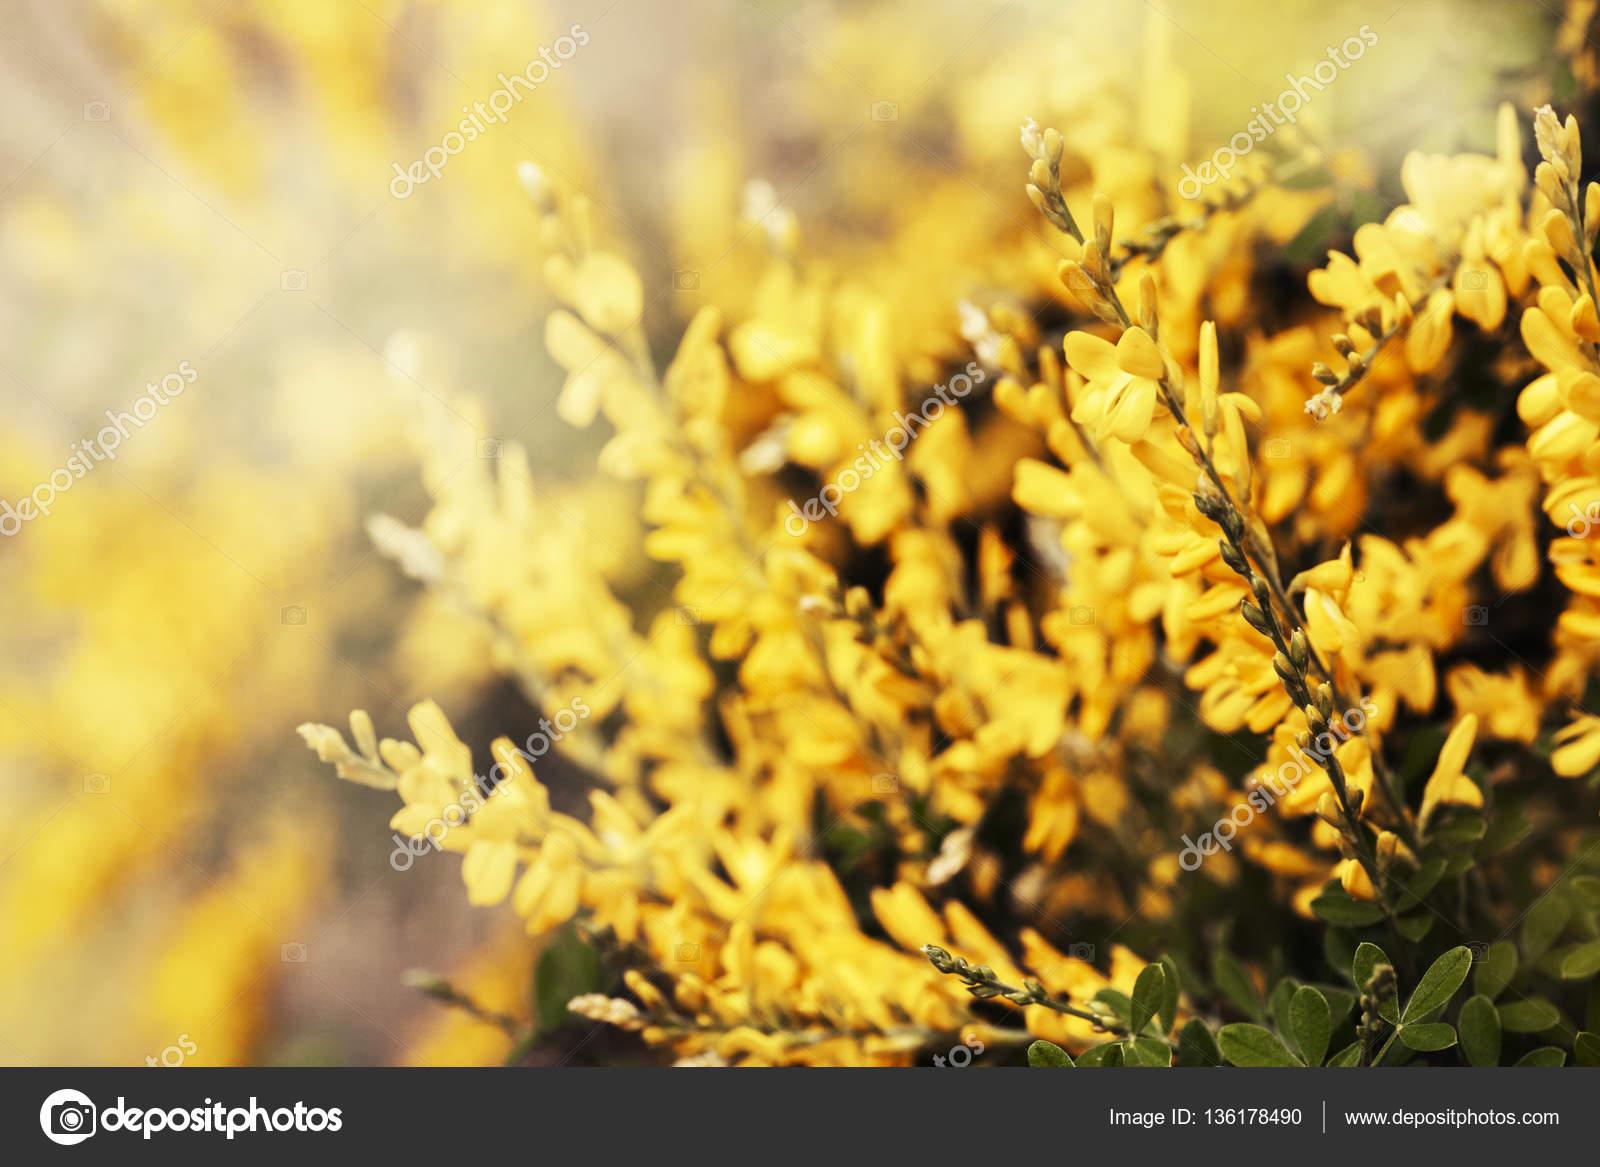 Bush bright yellow flowers sunny day stock photo artnature bush bright yellow flowers sunny day stock photo mightylinksfo